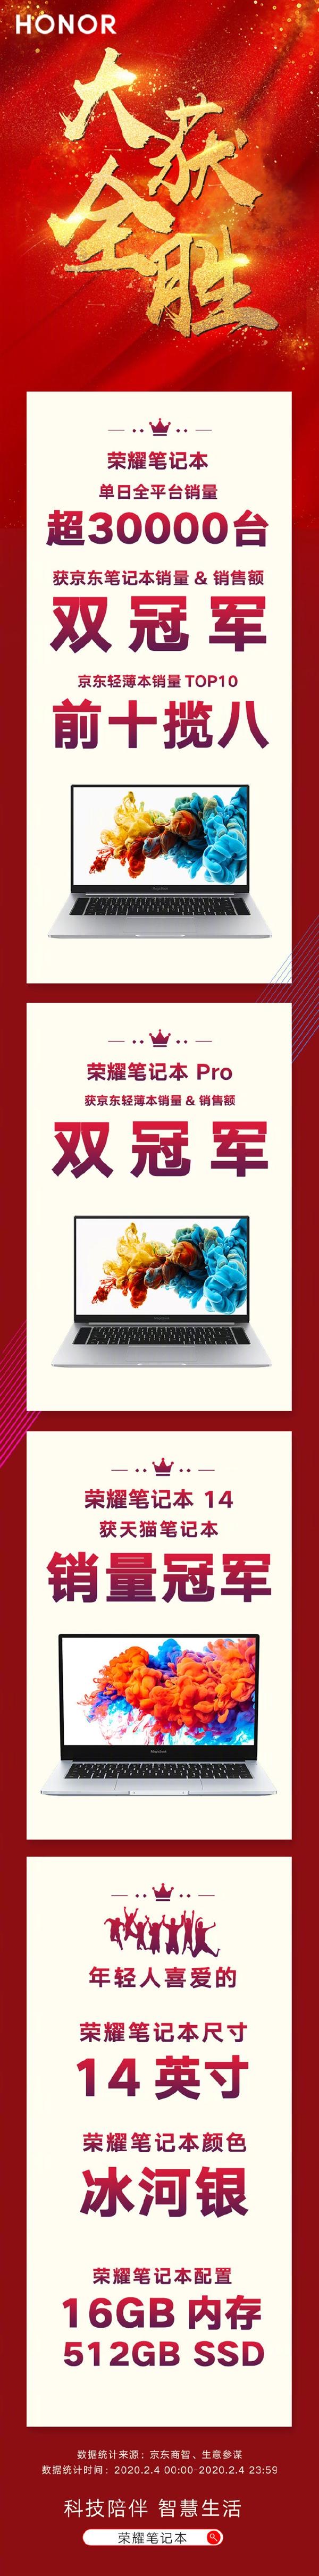 30,000 units of MagicBook